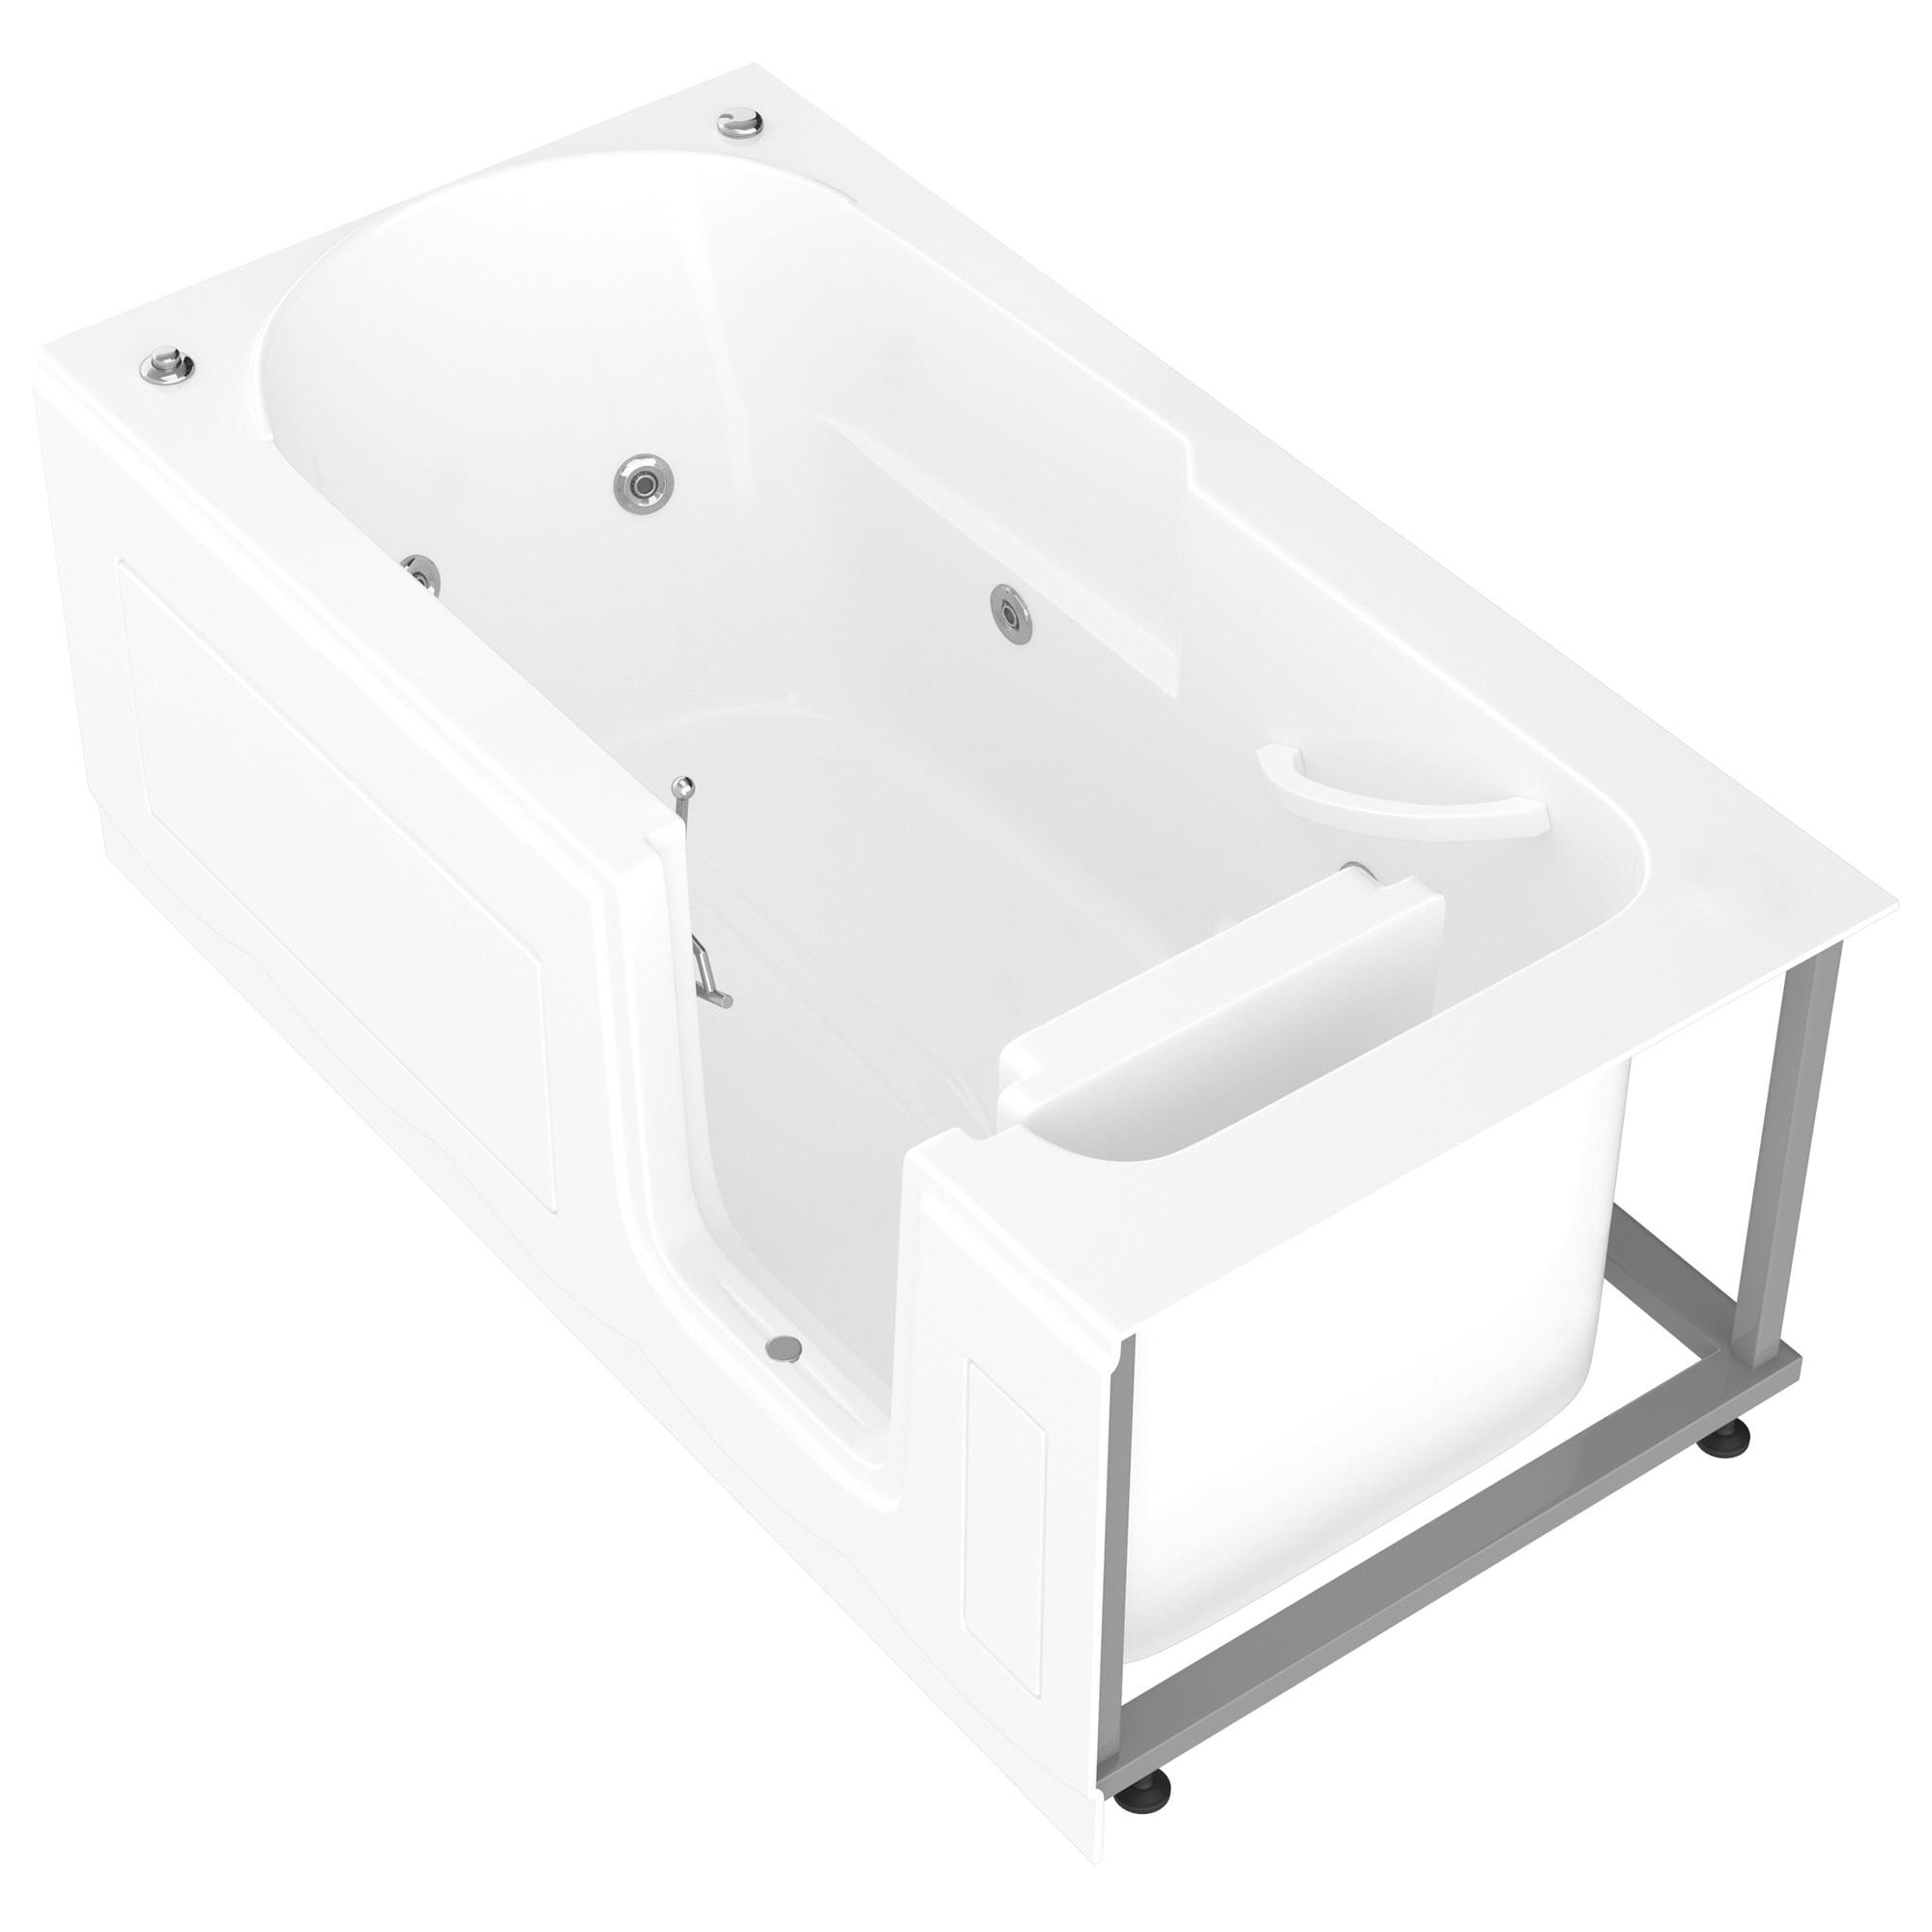 Buy Walk-In Tubs Online at Overstock.com | Our Best Bathtubs Deals